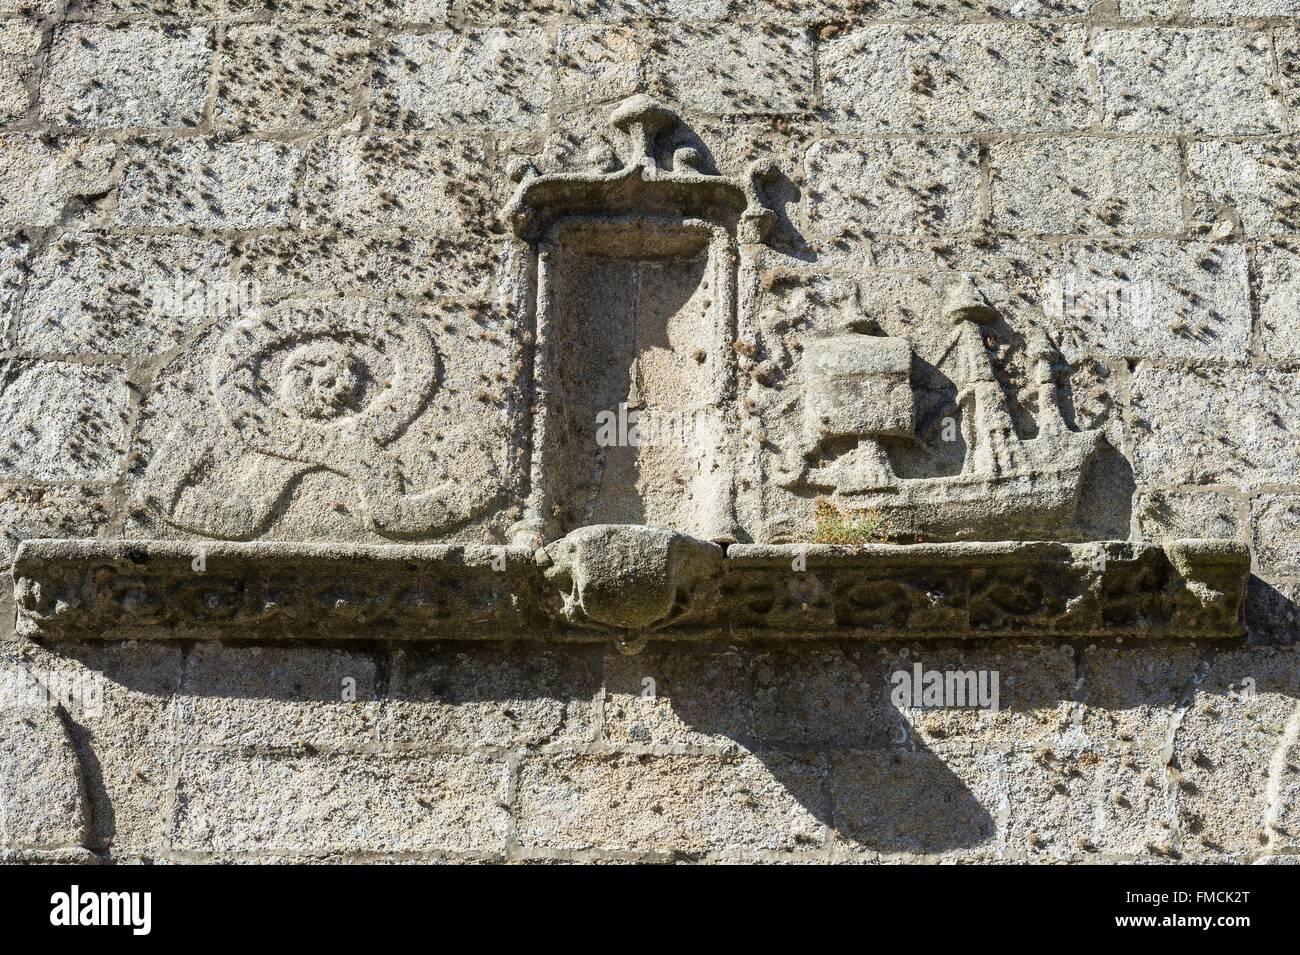 France, Finistere, Iroise Sea, Roscoff, caravel on the wall of Notre Dame de Croas Batz church - Stock Image